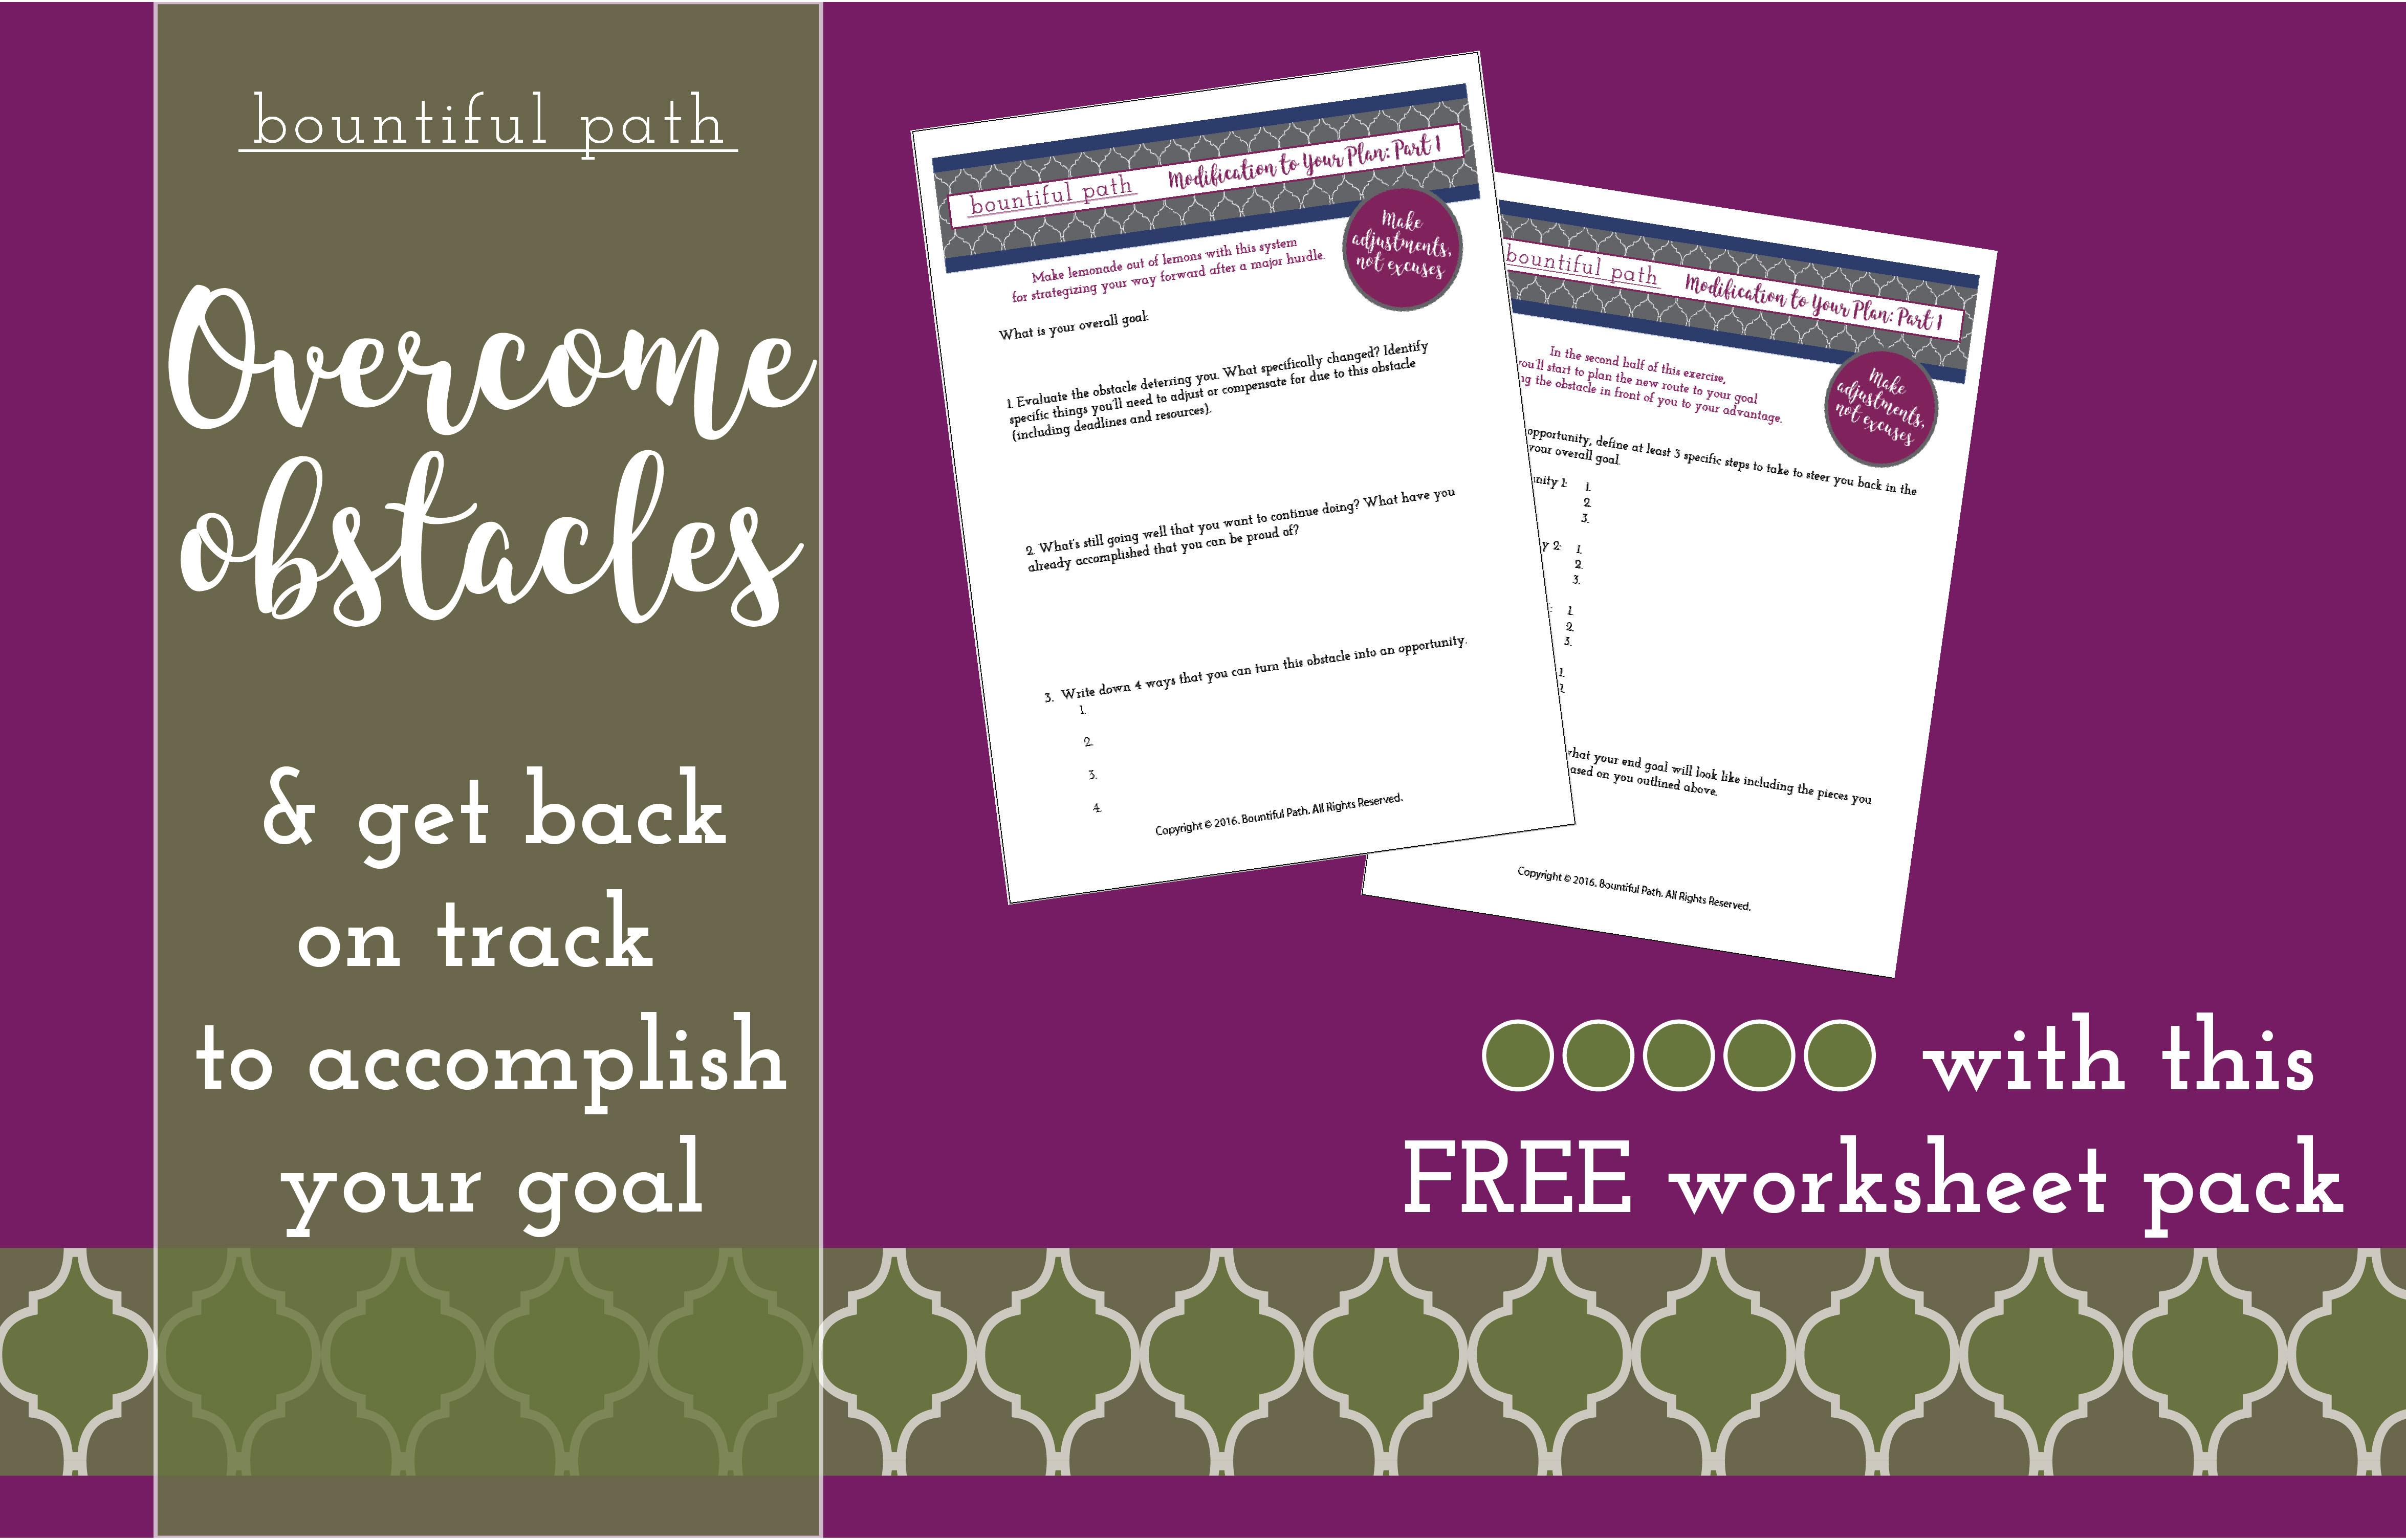 I need help accomplishing my goals!